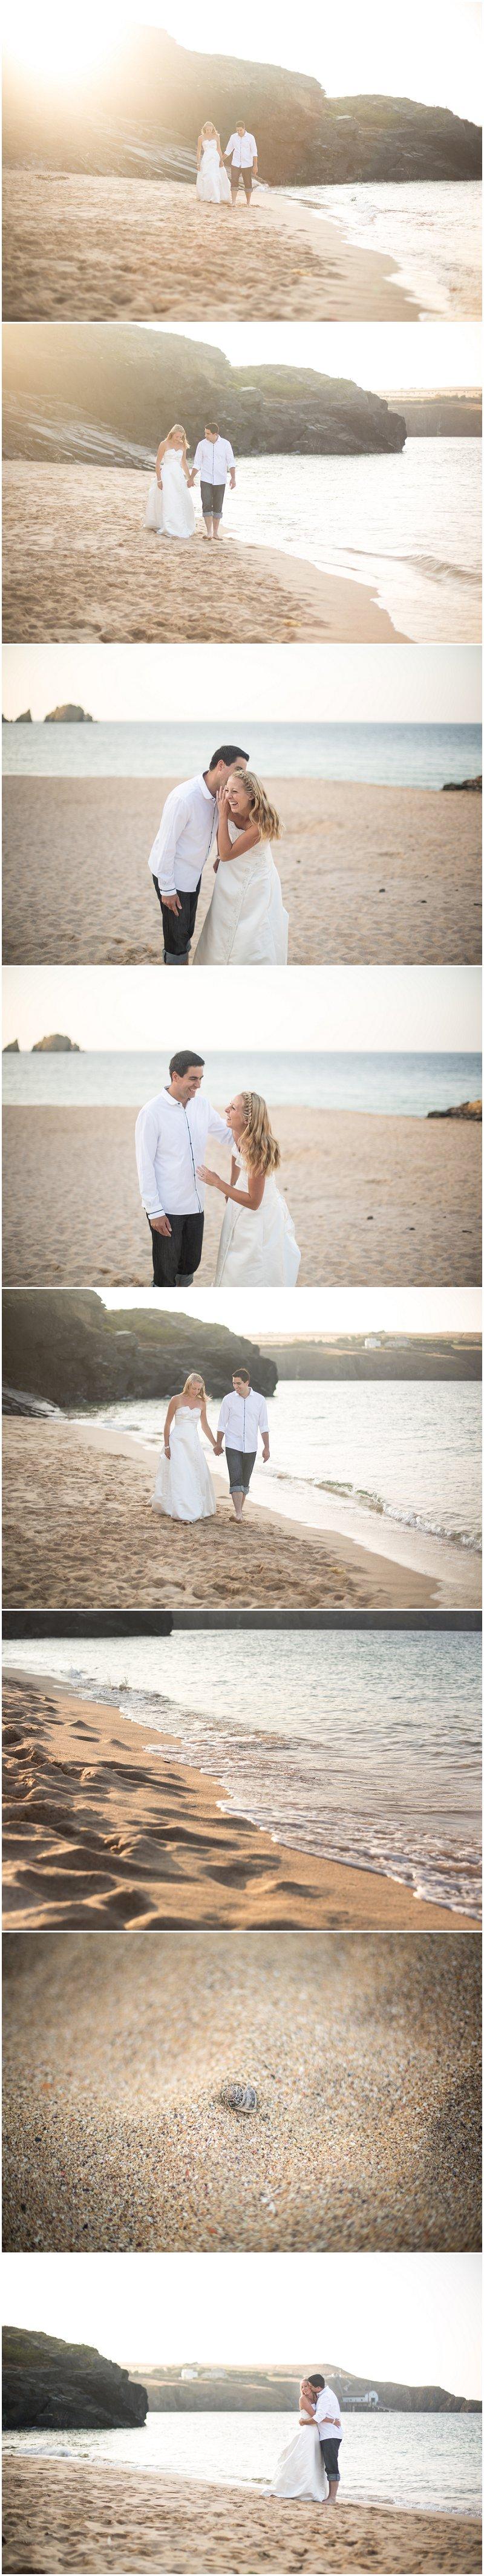 West Country Wedding Photographer Cornwall Bride & Groom on Beach